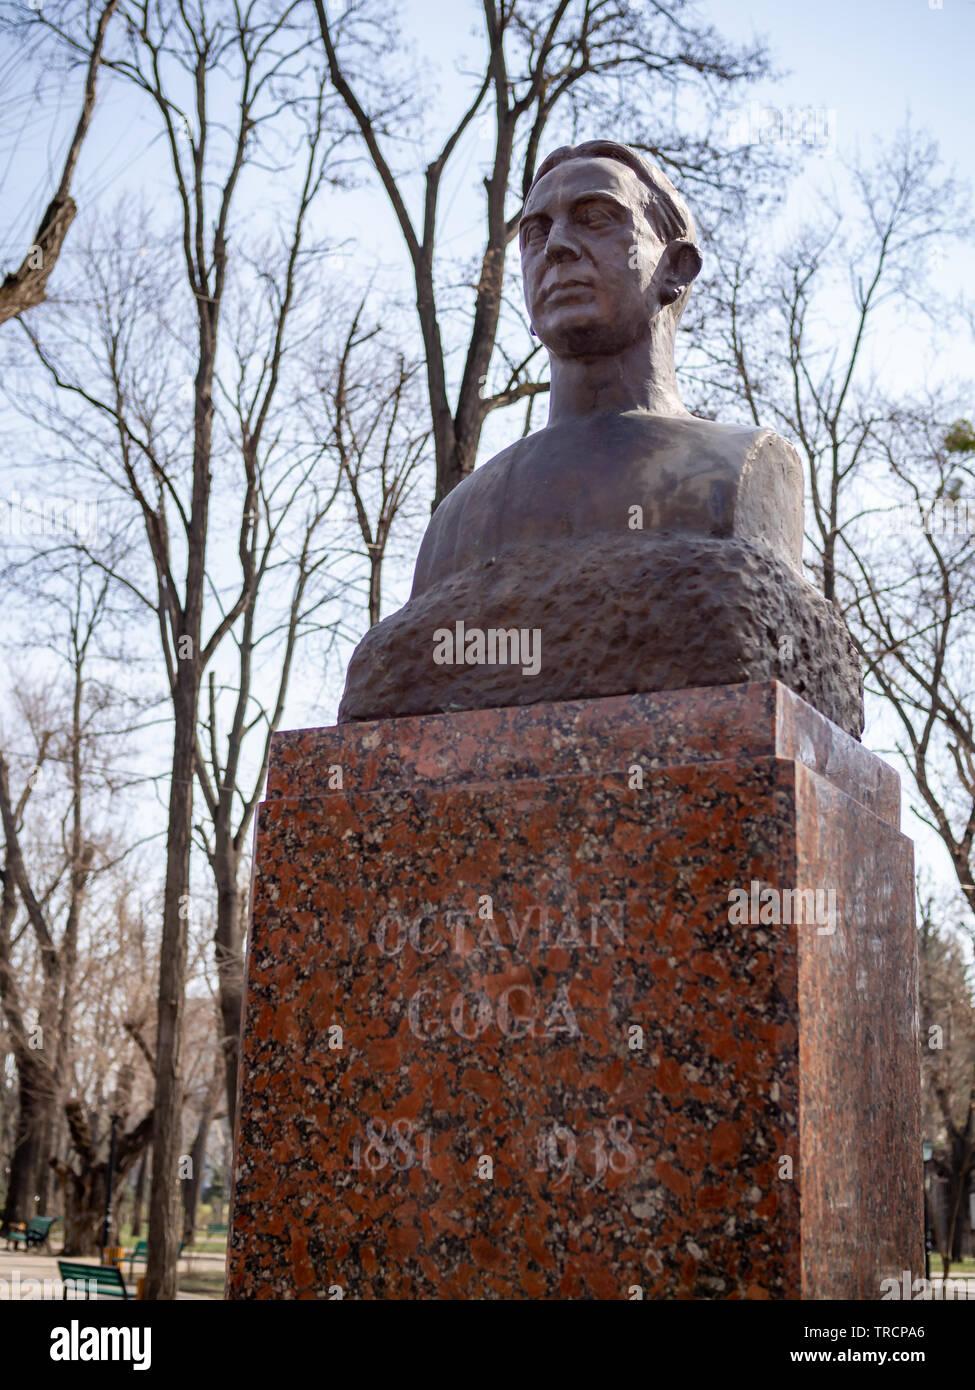 CHISINAU, MOLDOVA-MARCH 21, 2019: Octavian Goga bust by Cornel Medrea in the Alley of Classics - Stock Image